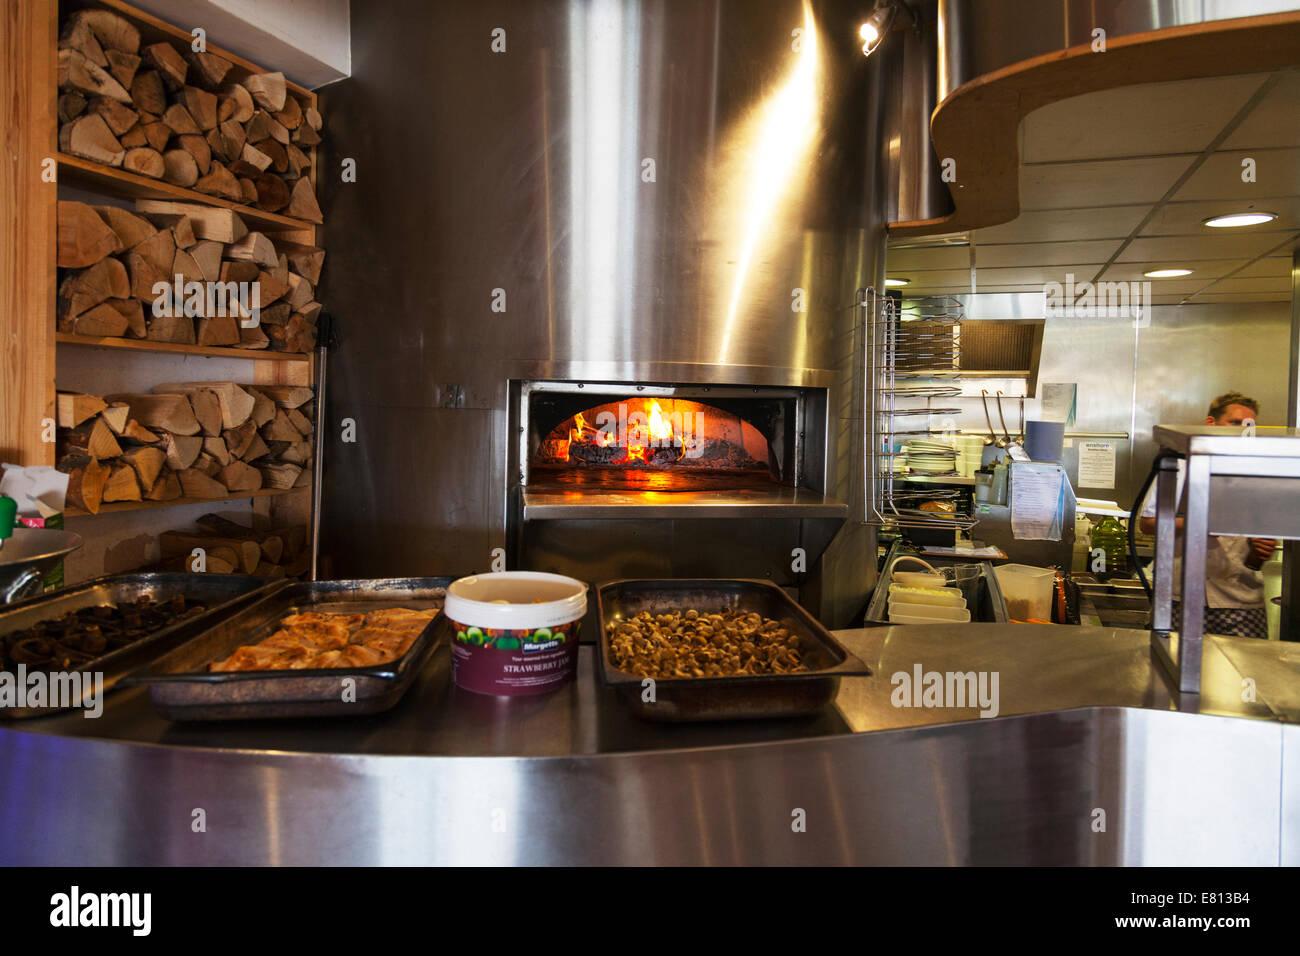 Restaurant Kitchen Pictures brilliant restaurant kitchen oven china trolley professional bread